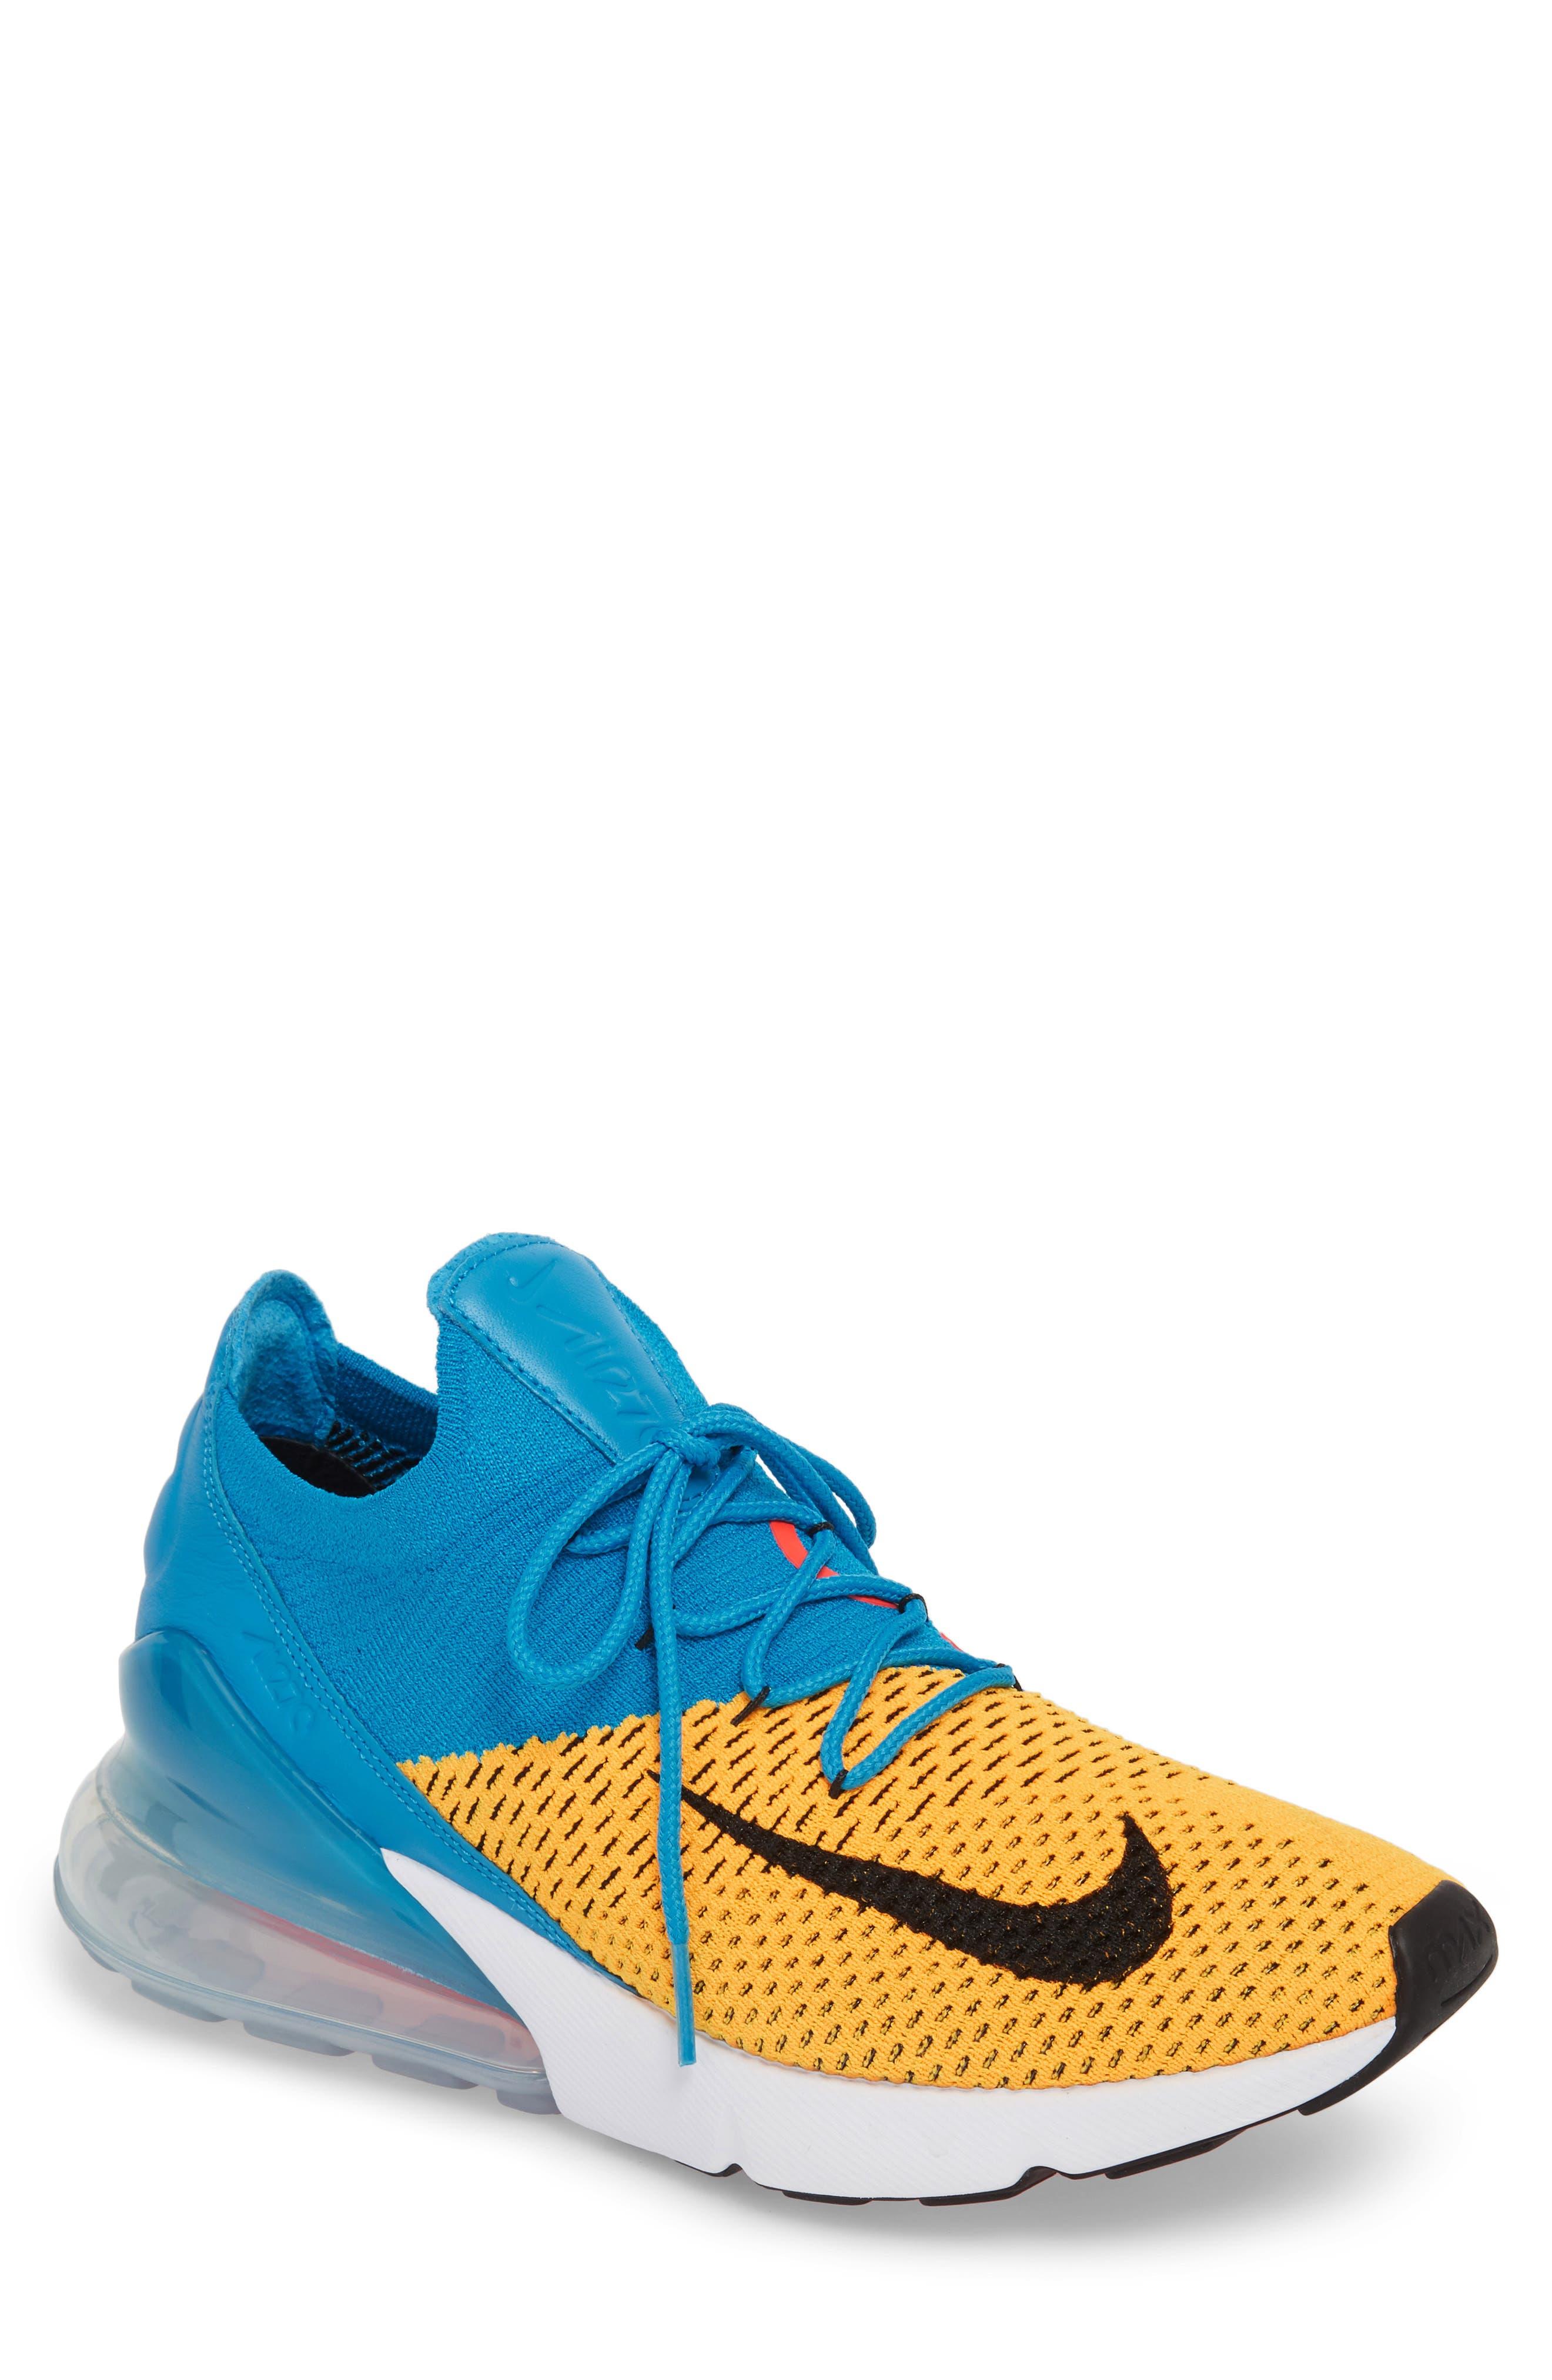 Nike Air Max 270 Flyknit Sneaker (Men)